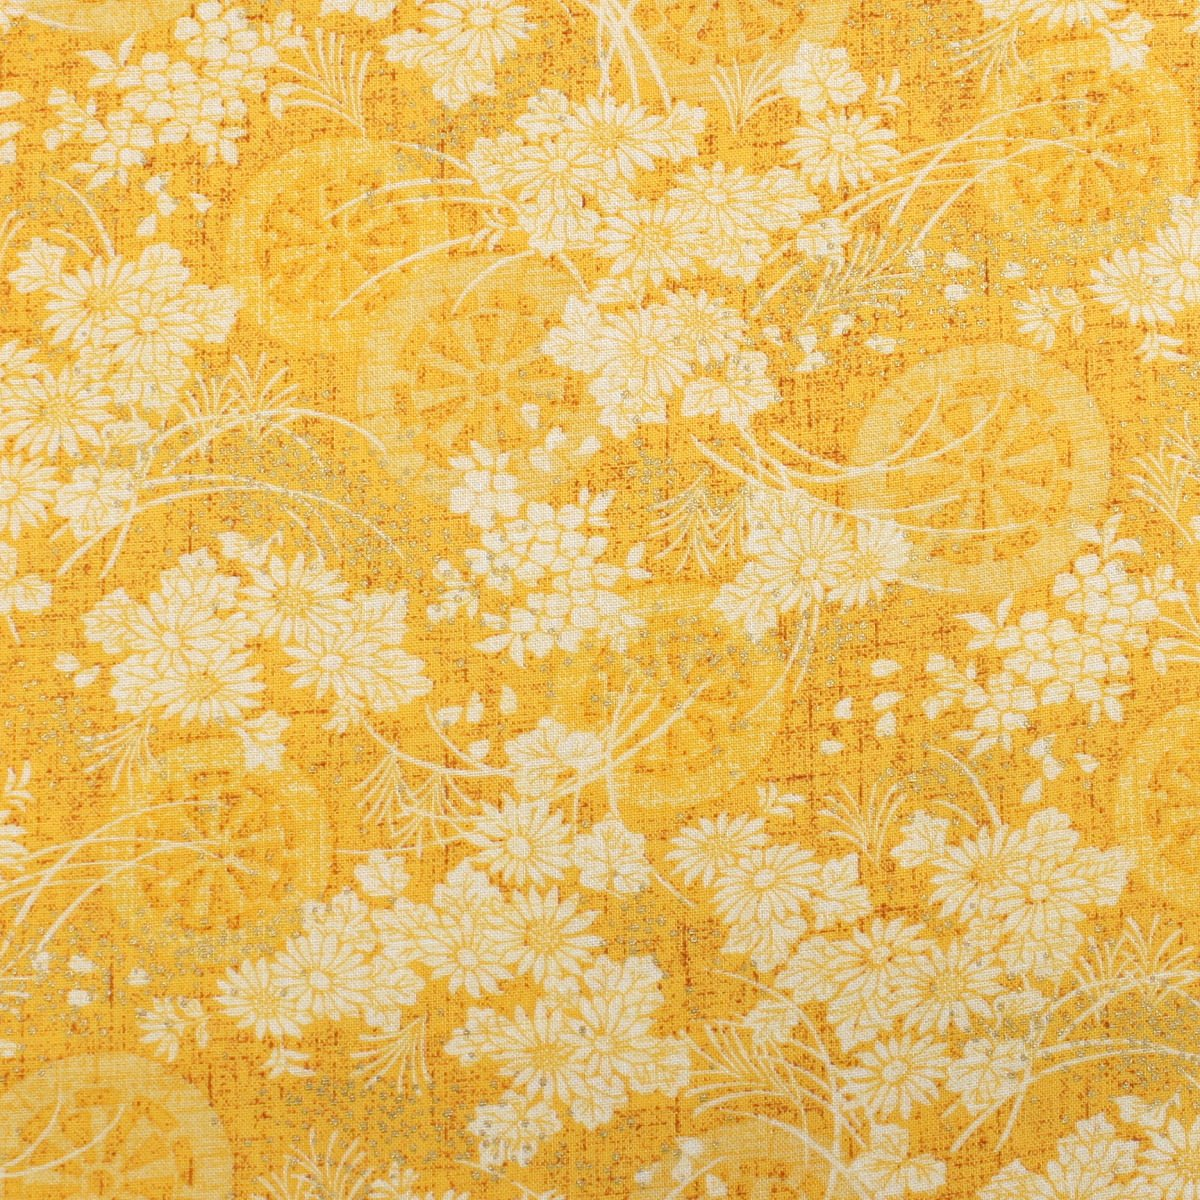 Top marca designer Craft Dress making quilting bandierine top quality 100% cotone fat quarter–Prezzo incredibile.